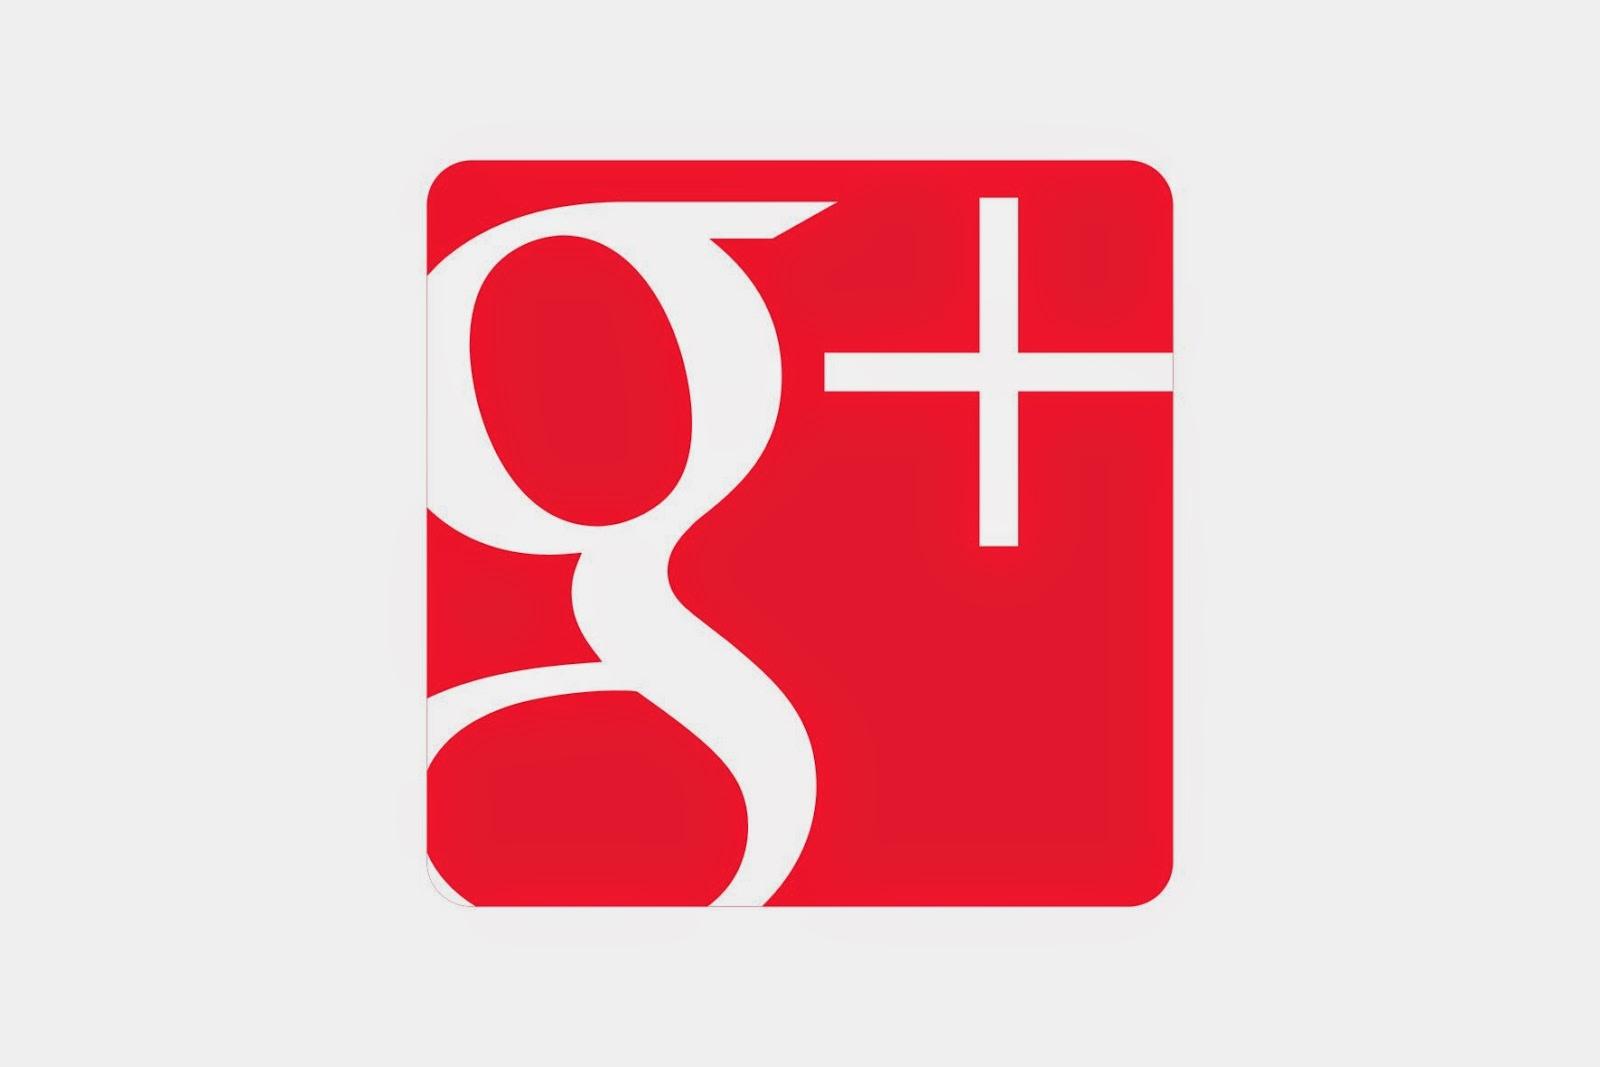 Google Plus Logo image #1261